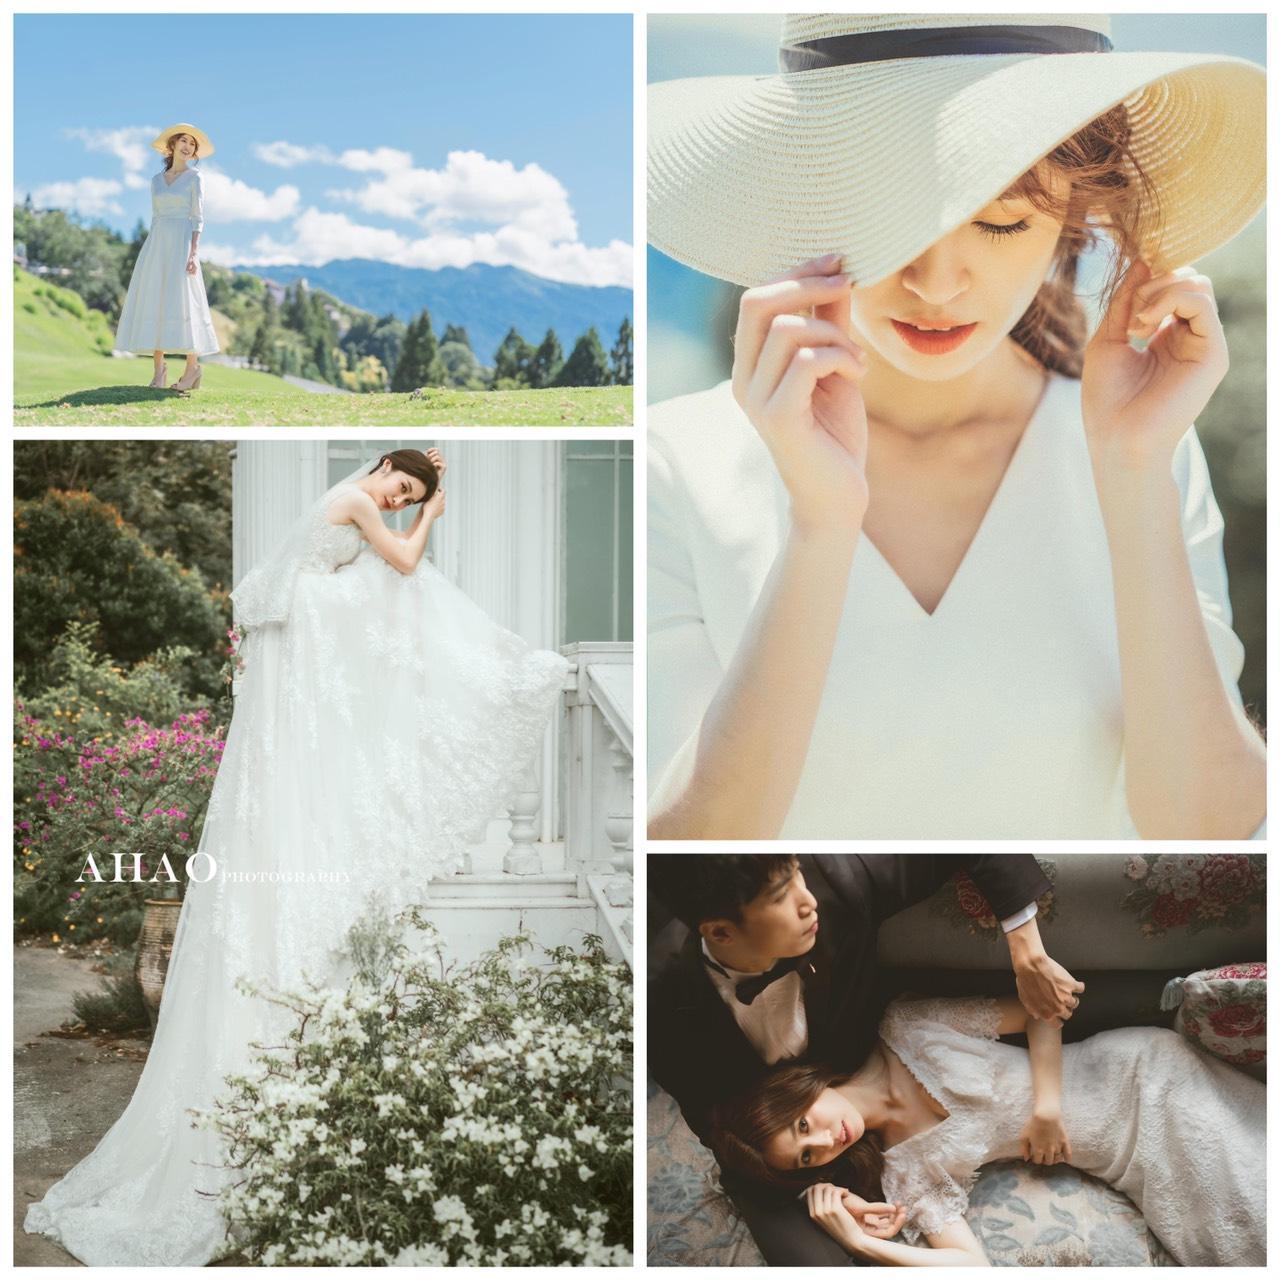 6. AHAO Photography,桃園婚紗工作室推薦